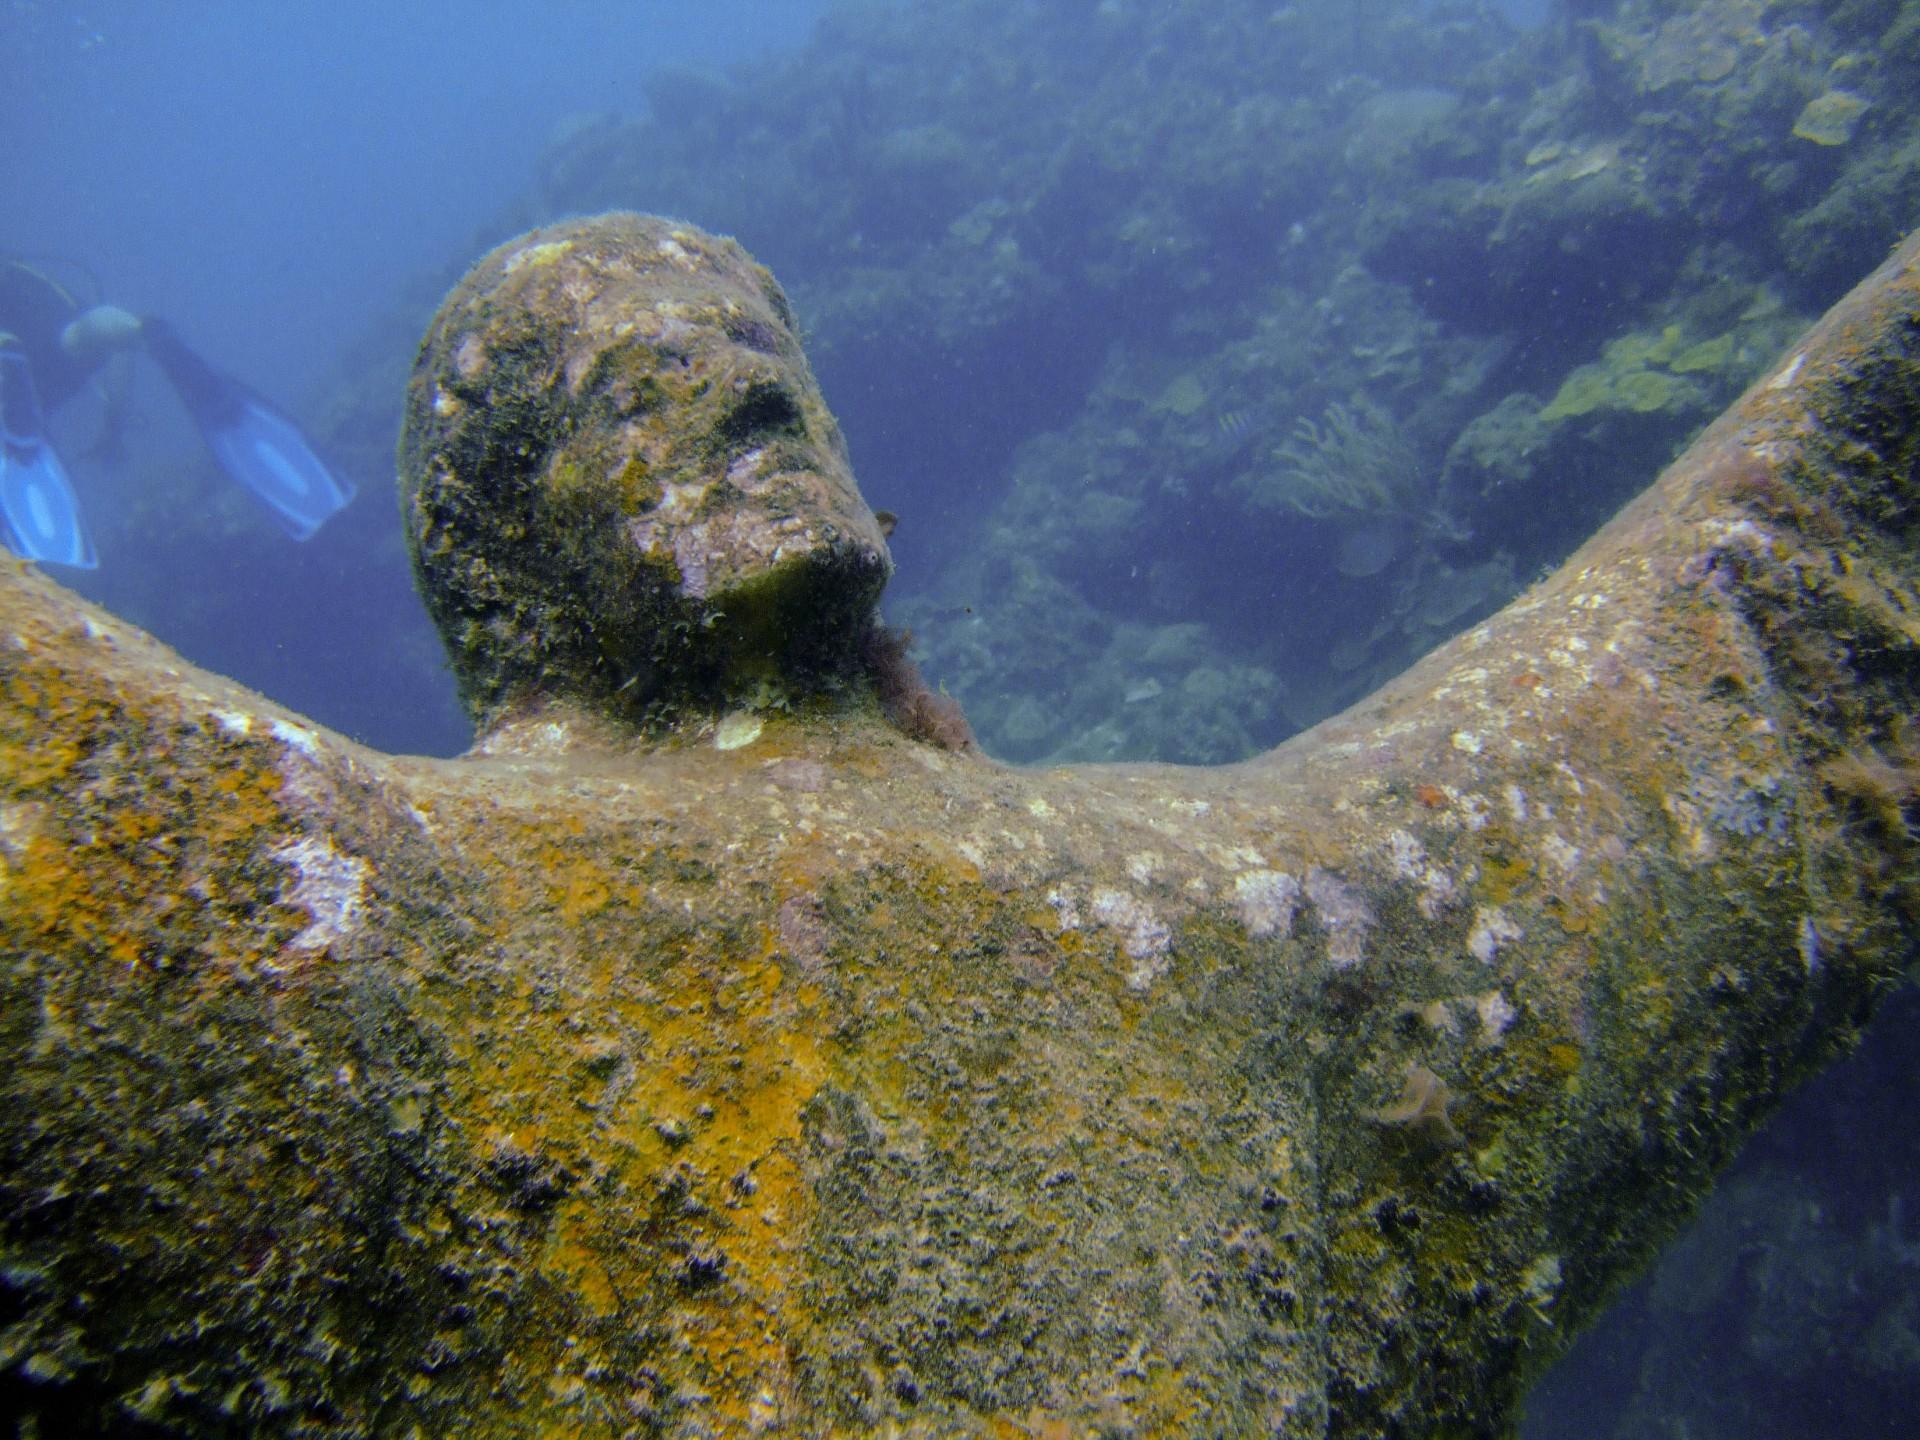 Statue of christ in Grenada Underwater sculpture park